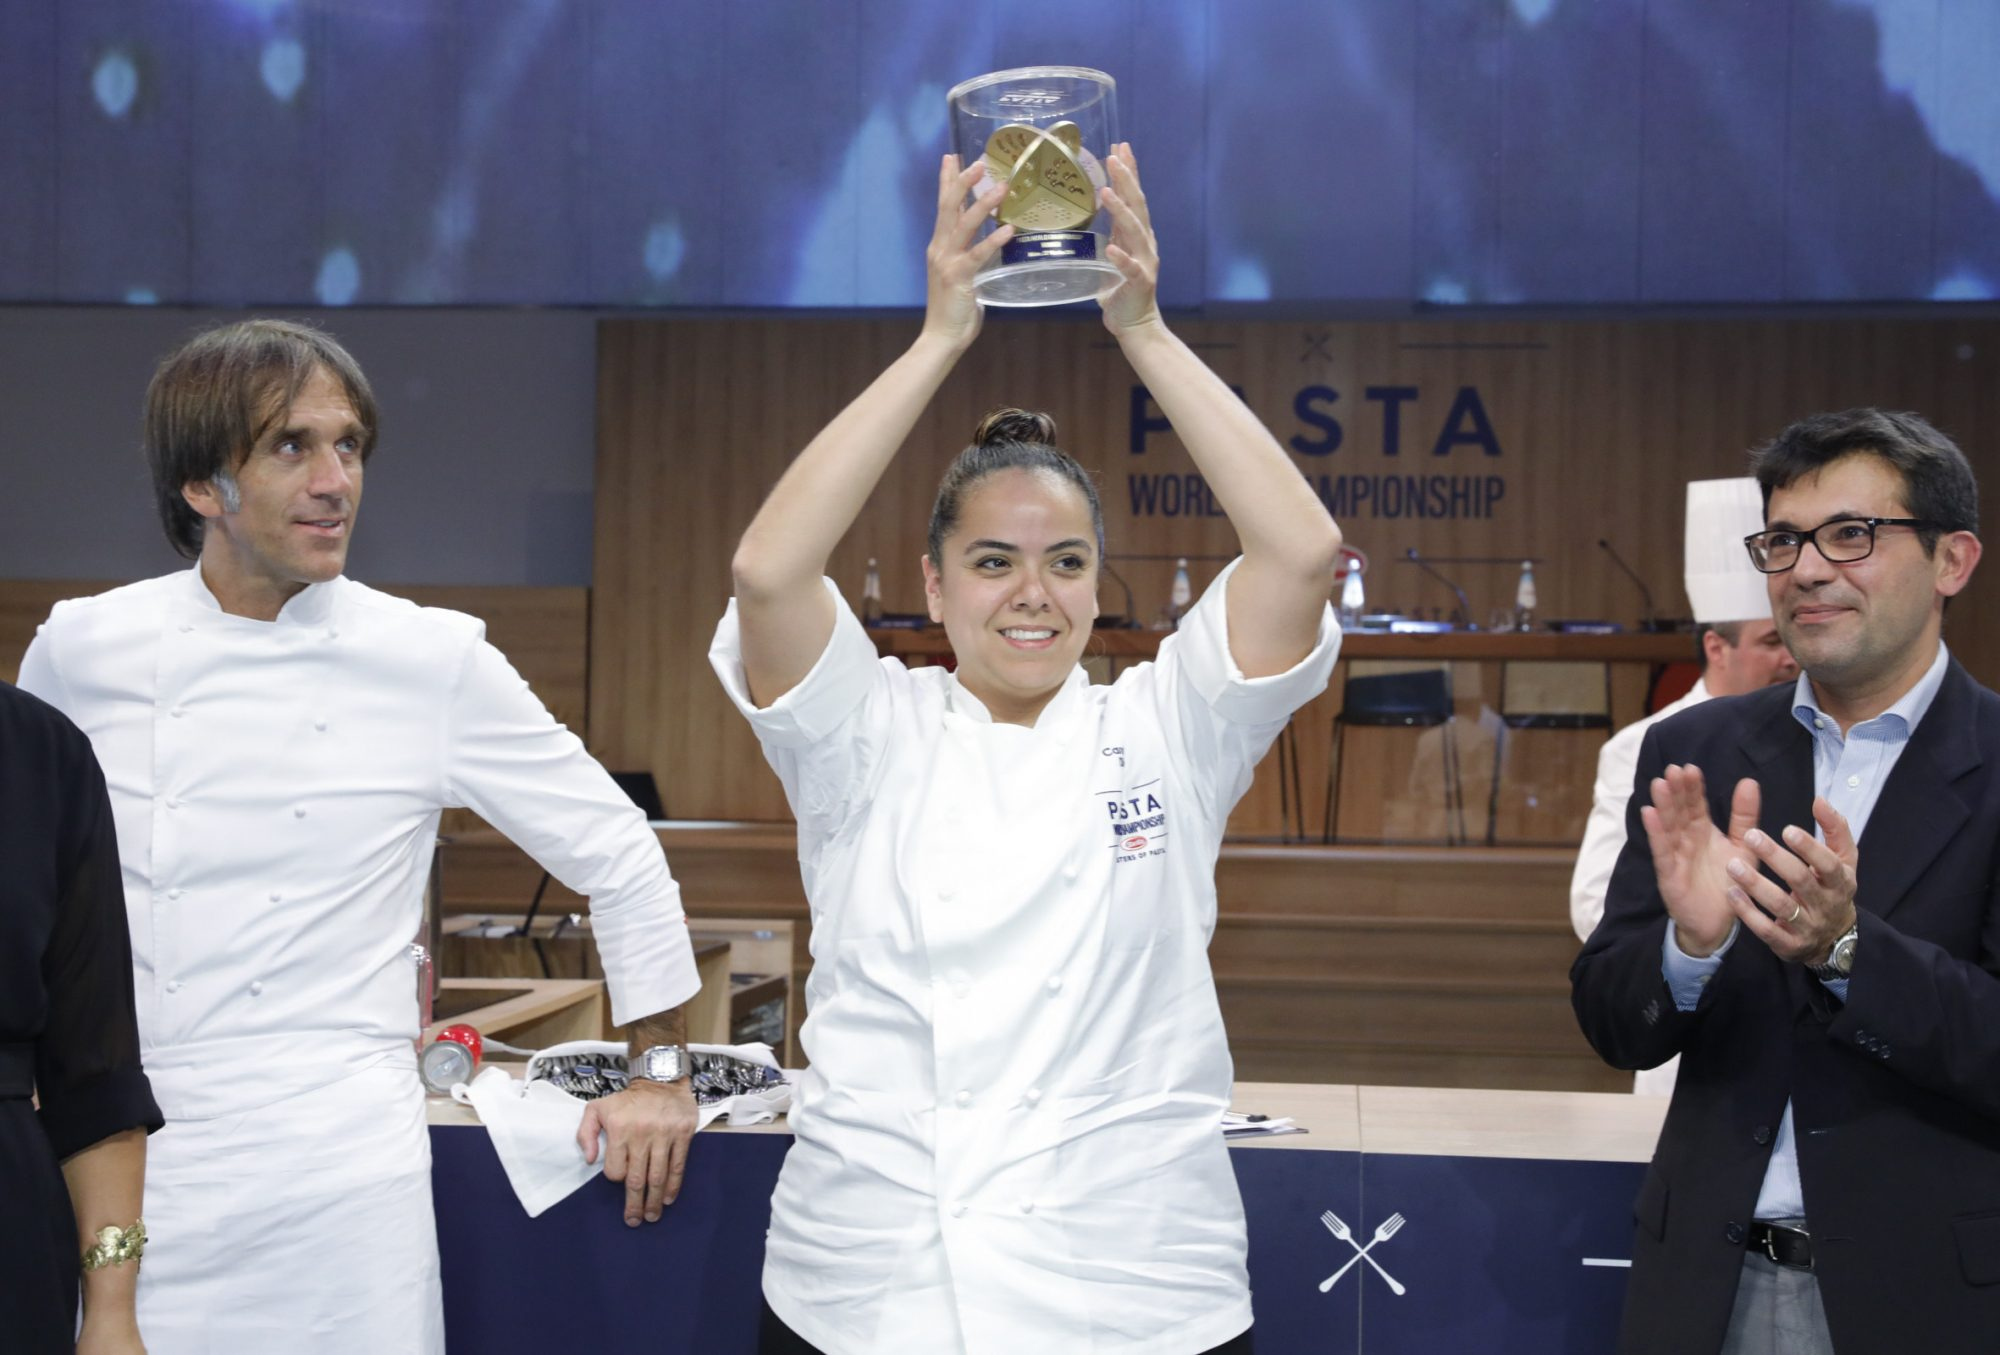 pasta_champion.jpeg